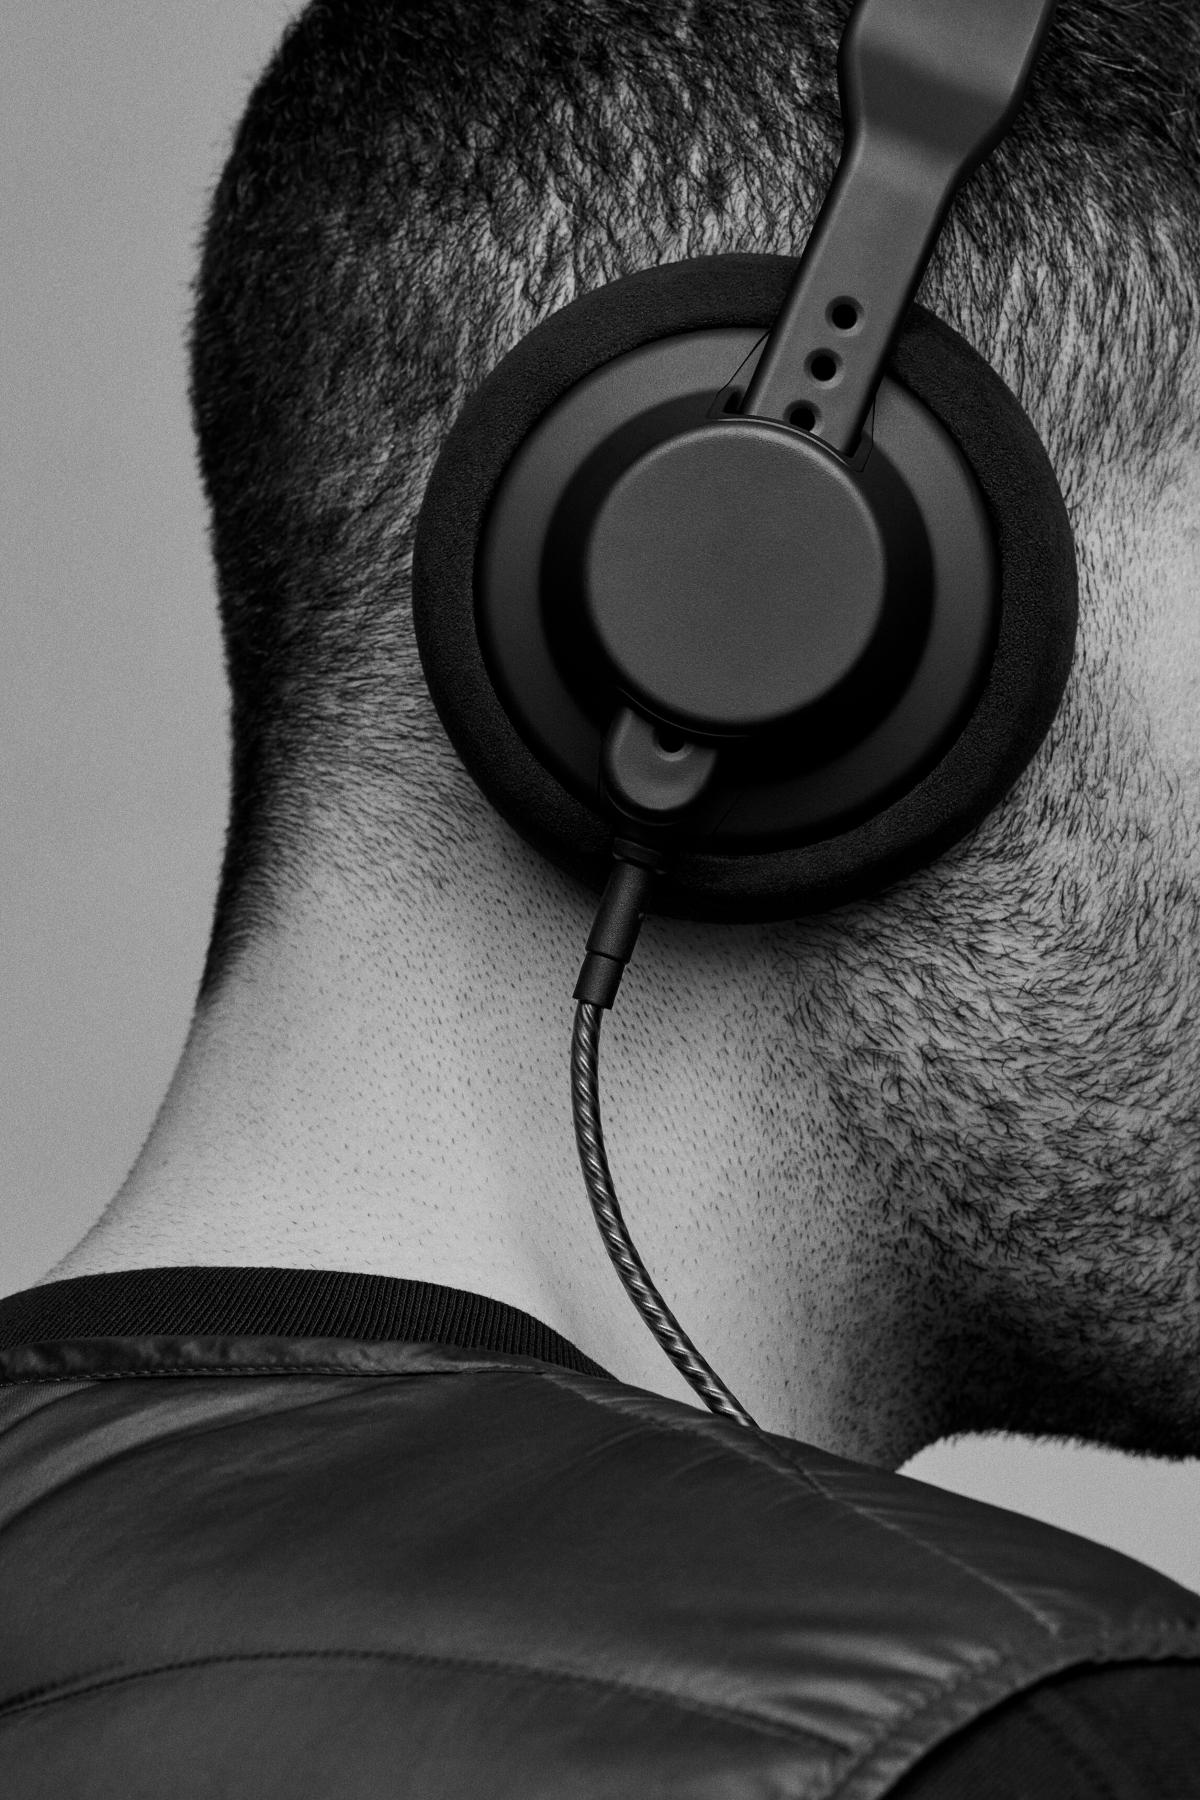 TMA-2 HD Wireless Modular Headphones - Crystal Clear Sound